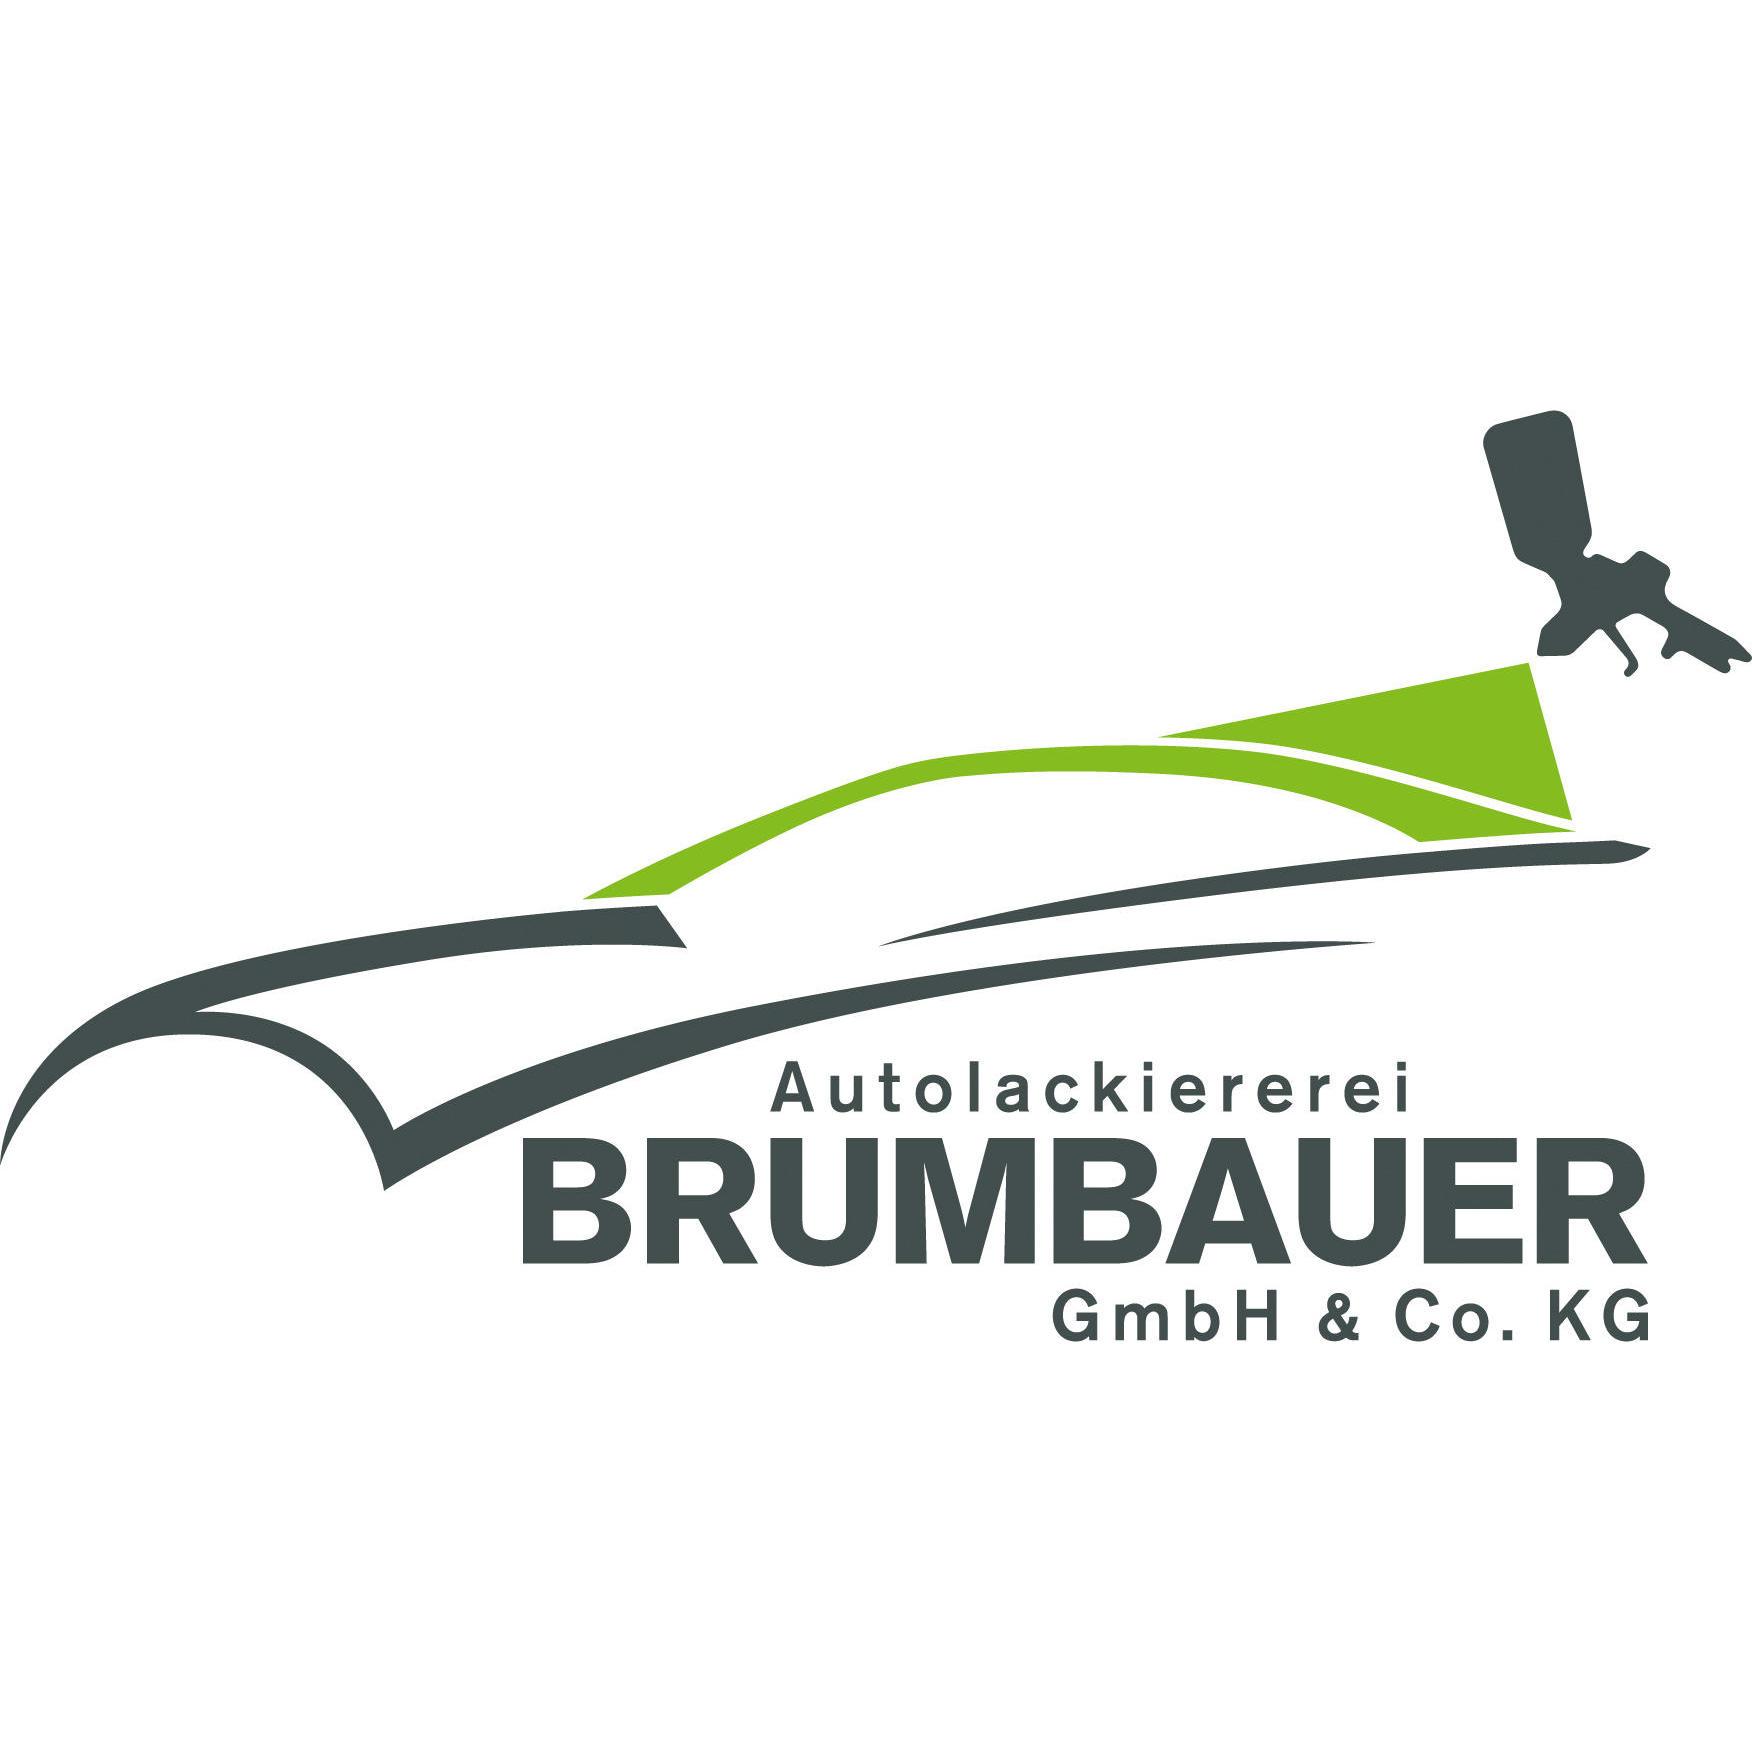 Logo von GmbH & Co. KG Autolackiererei Brumbauer